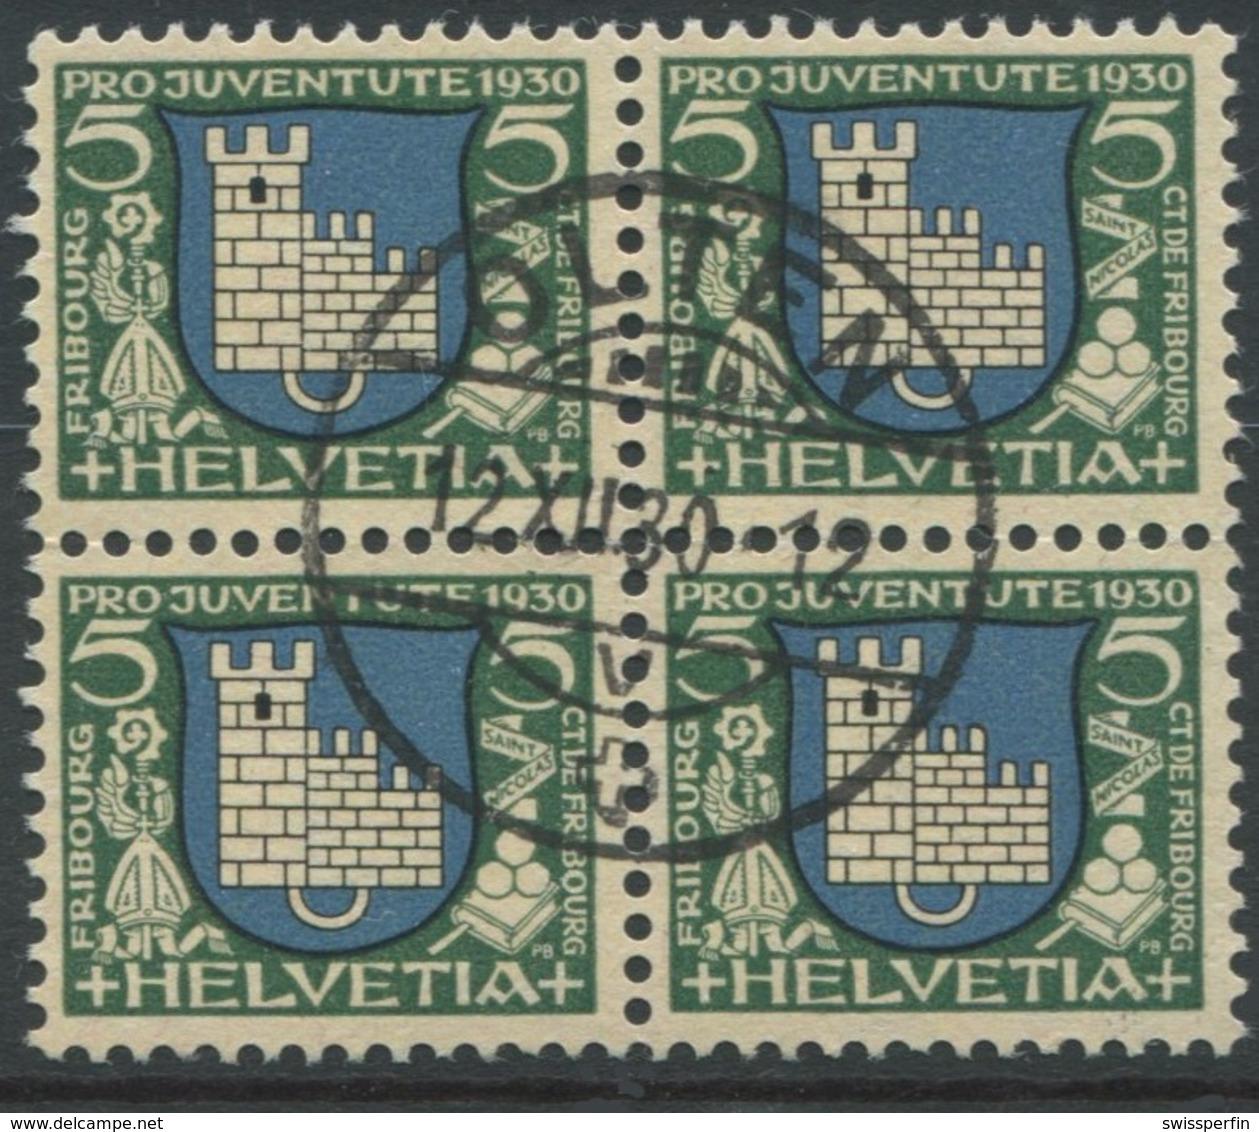 1813 - 5 Rp. Fribourg Mit Zentrumstempel Stempel OLTEN 12.XII.30 - Pro Juventute